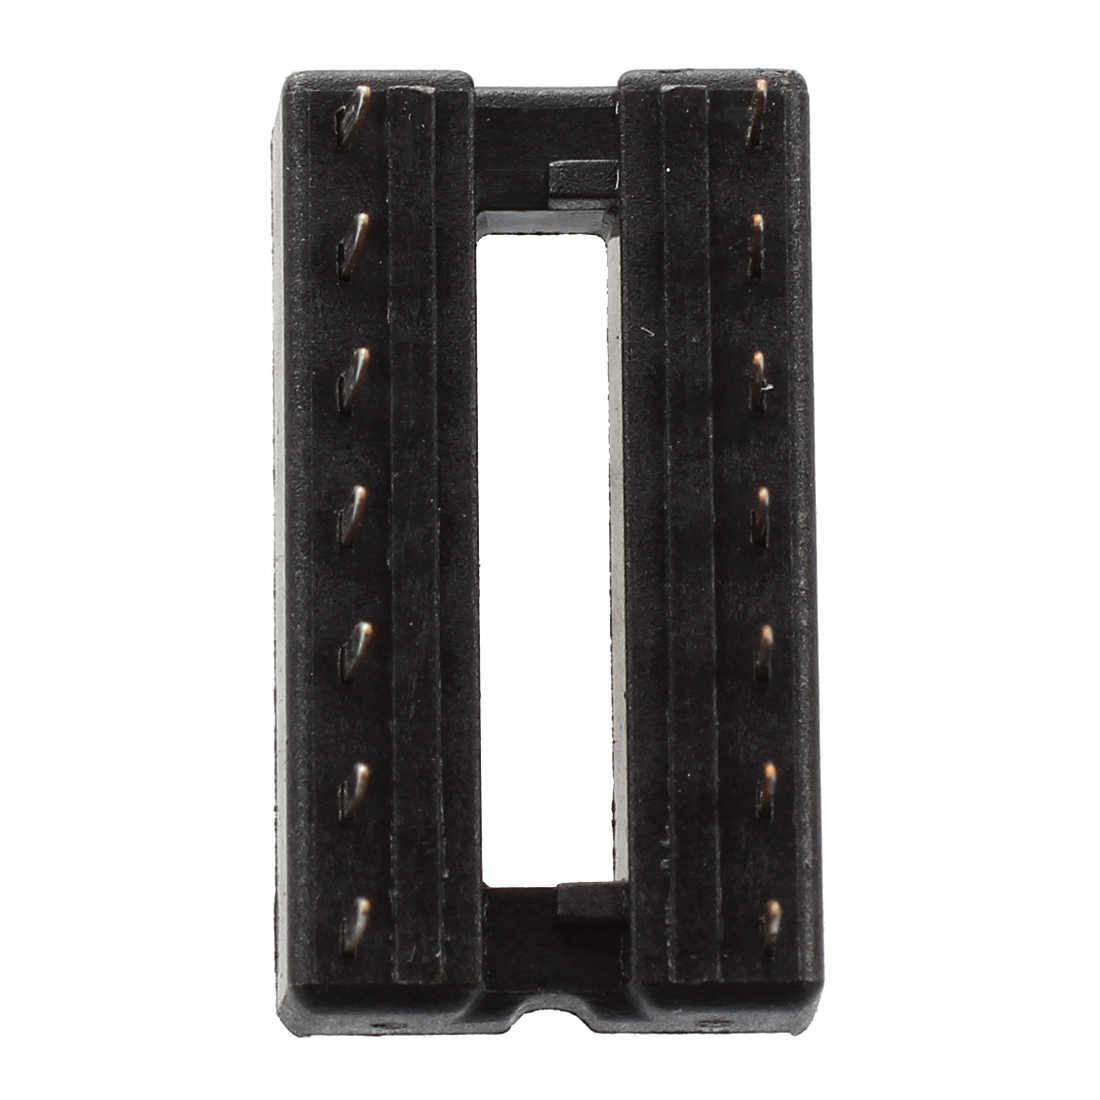 20 adet 14 pin 2.54mm Pitch DIP IC prizler lehim tipi adaptörler